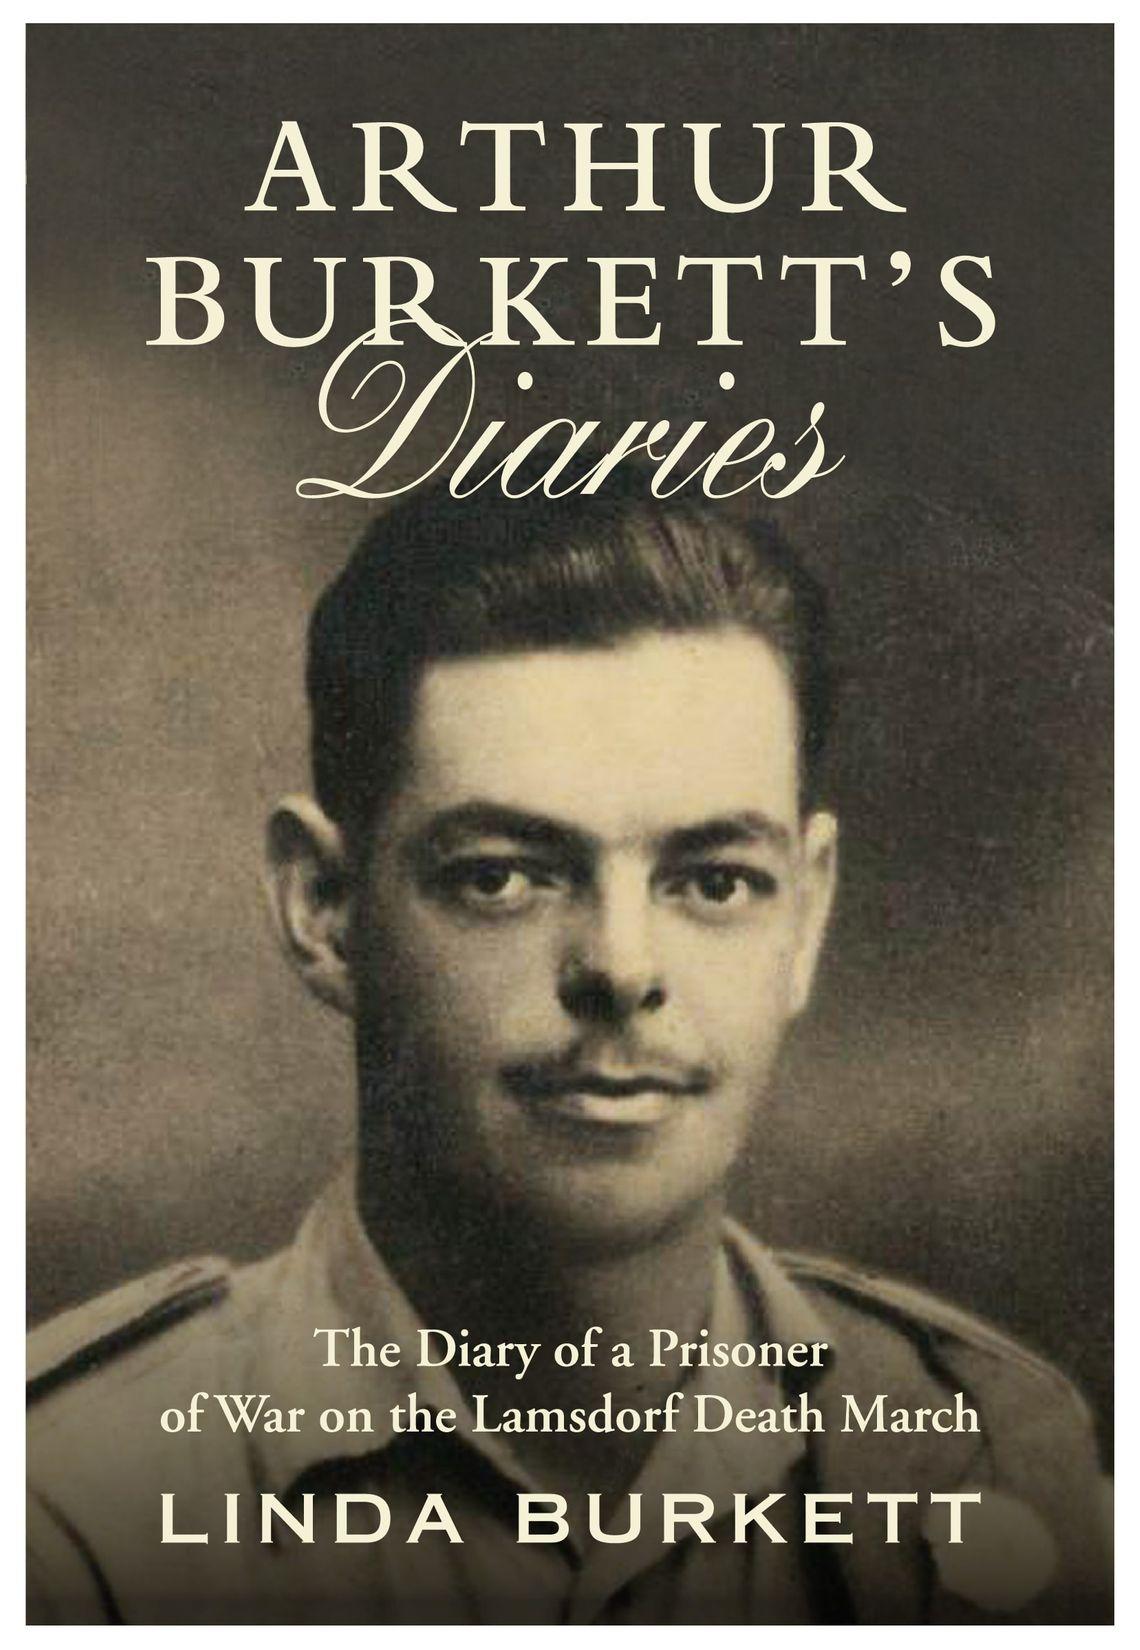 The Story Behind 'Arthur Burkett's Diaries'